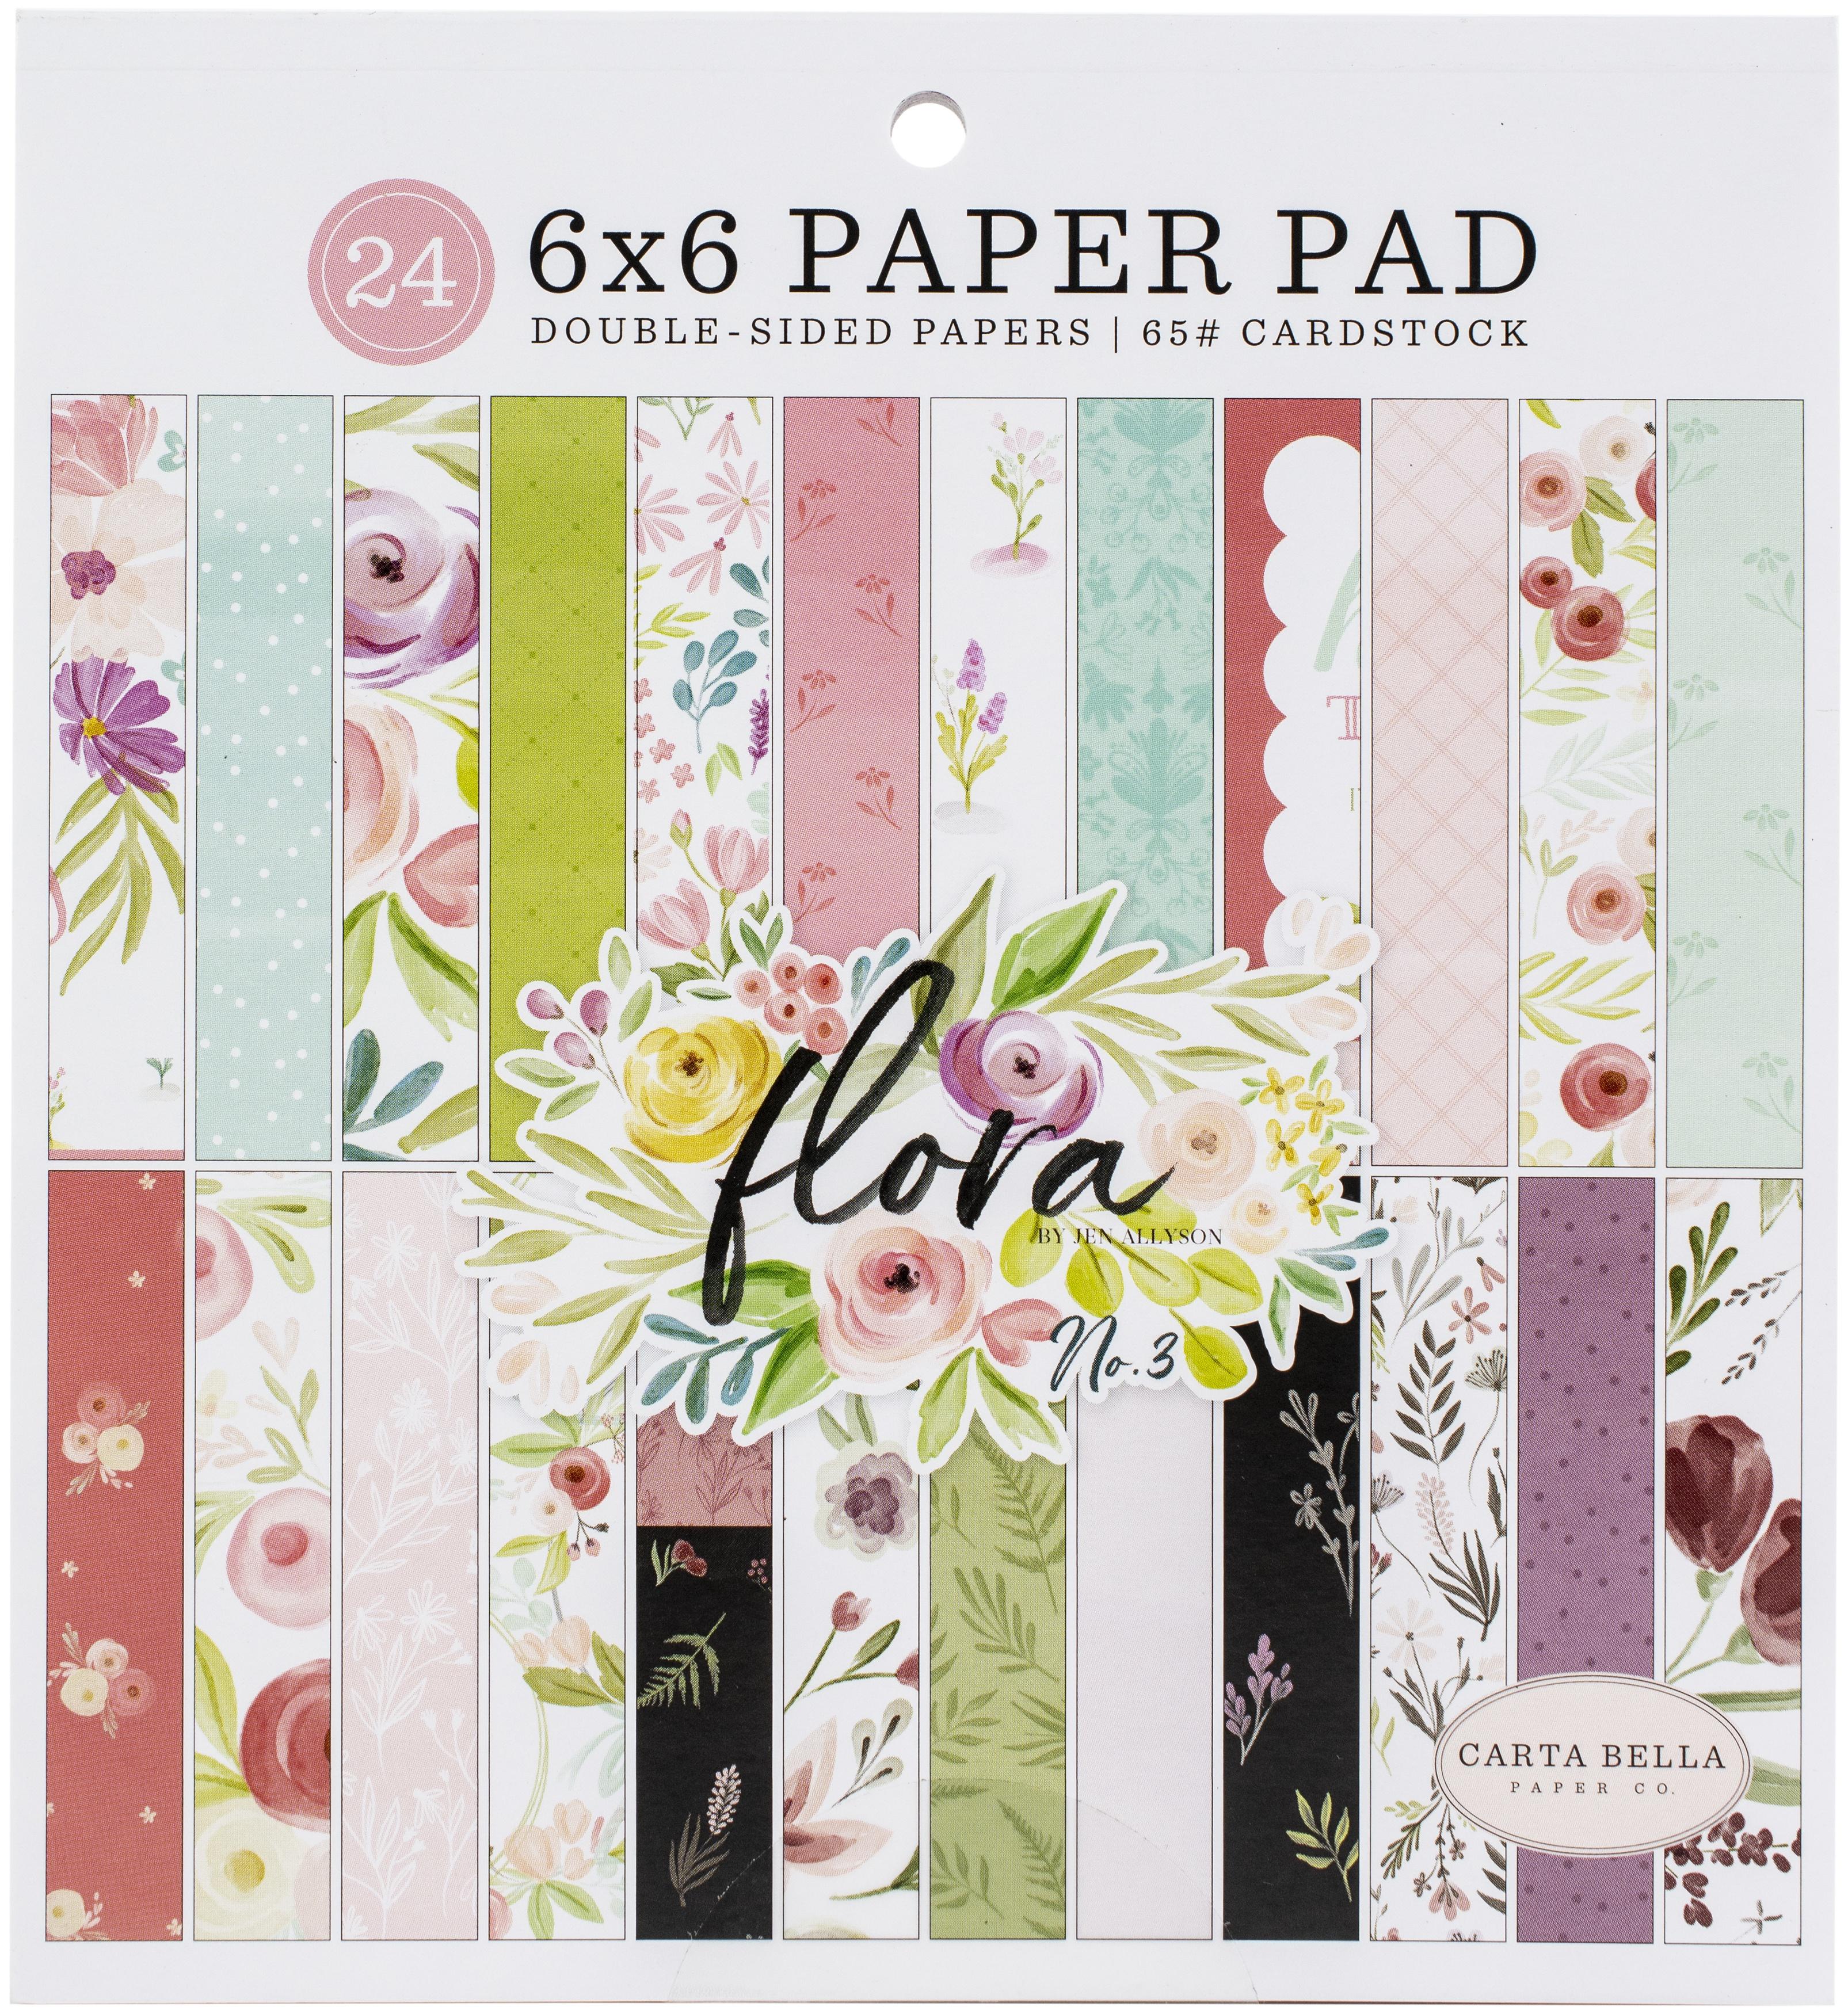 Carta Bella Double-Sided Paper Pad 6X6 24/Pkg-Flora No. 3, 12 Designs/2 Each